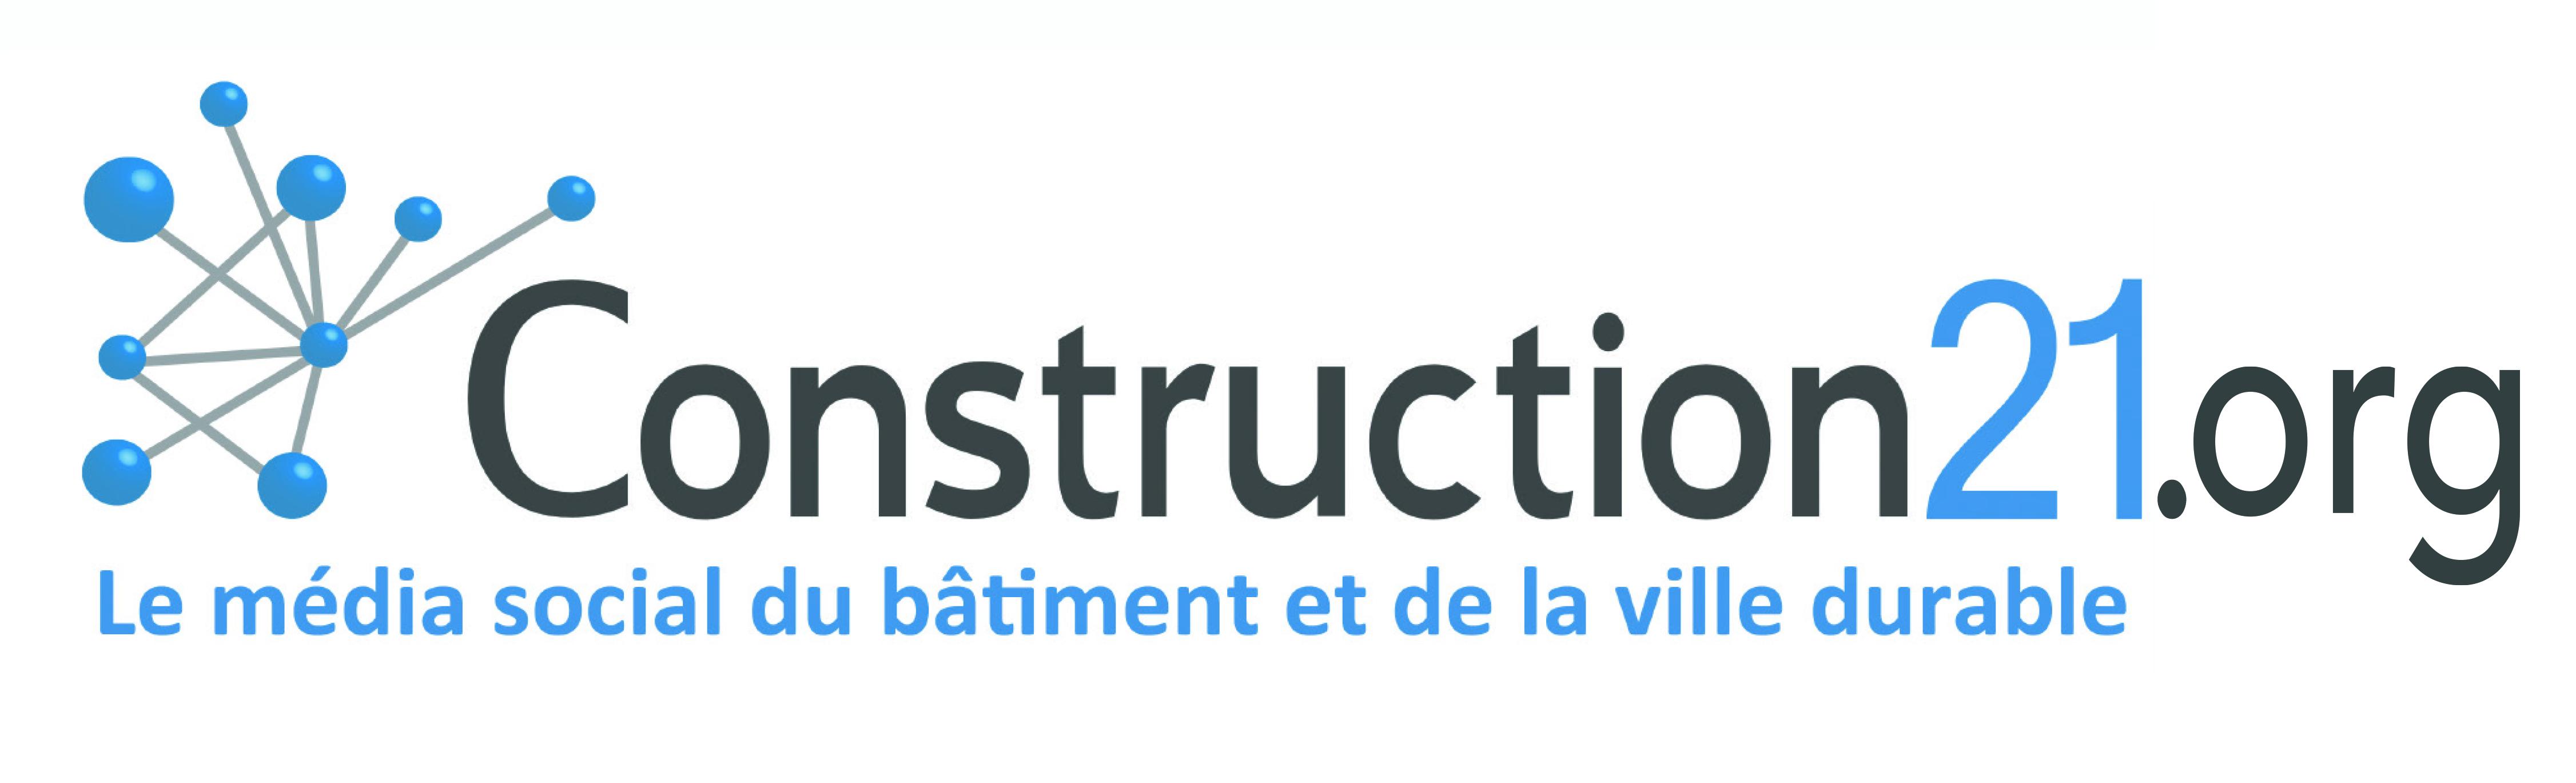 Construction 21